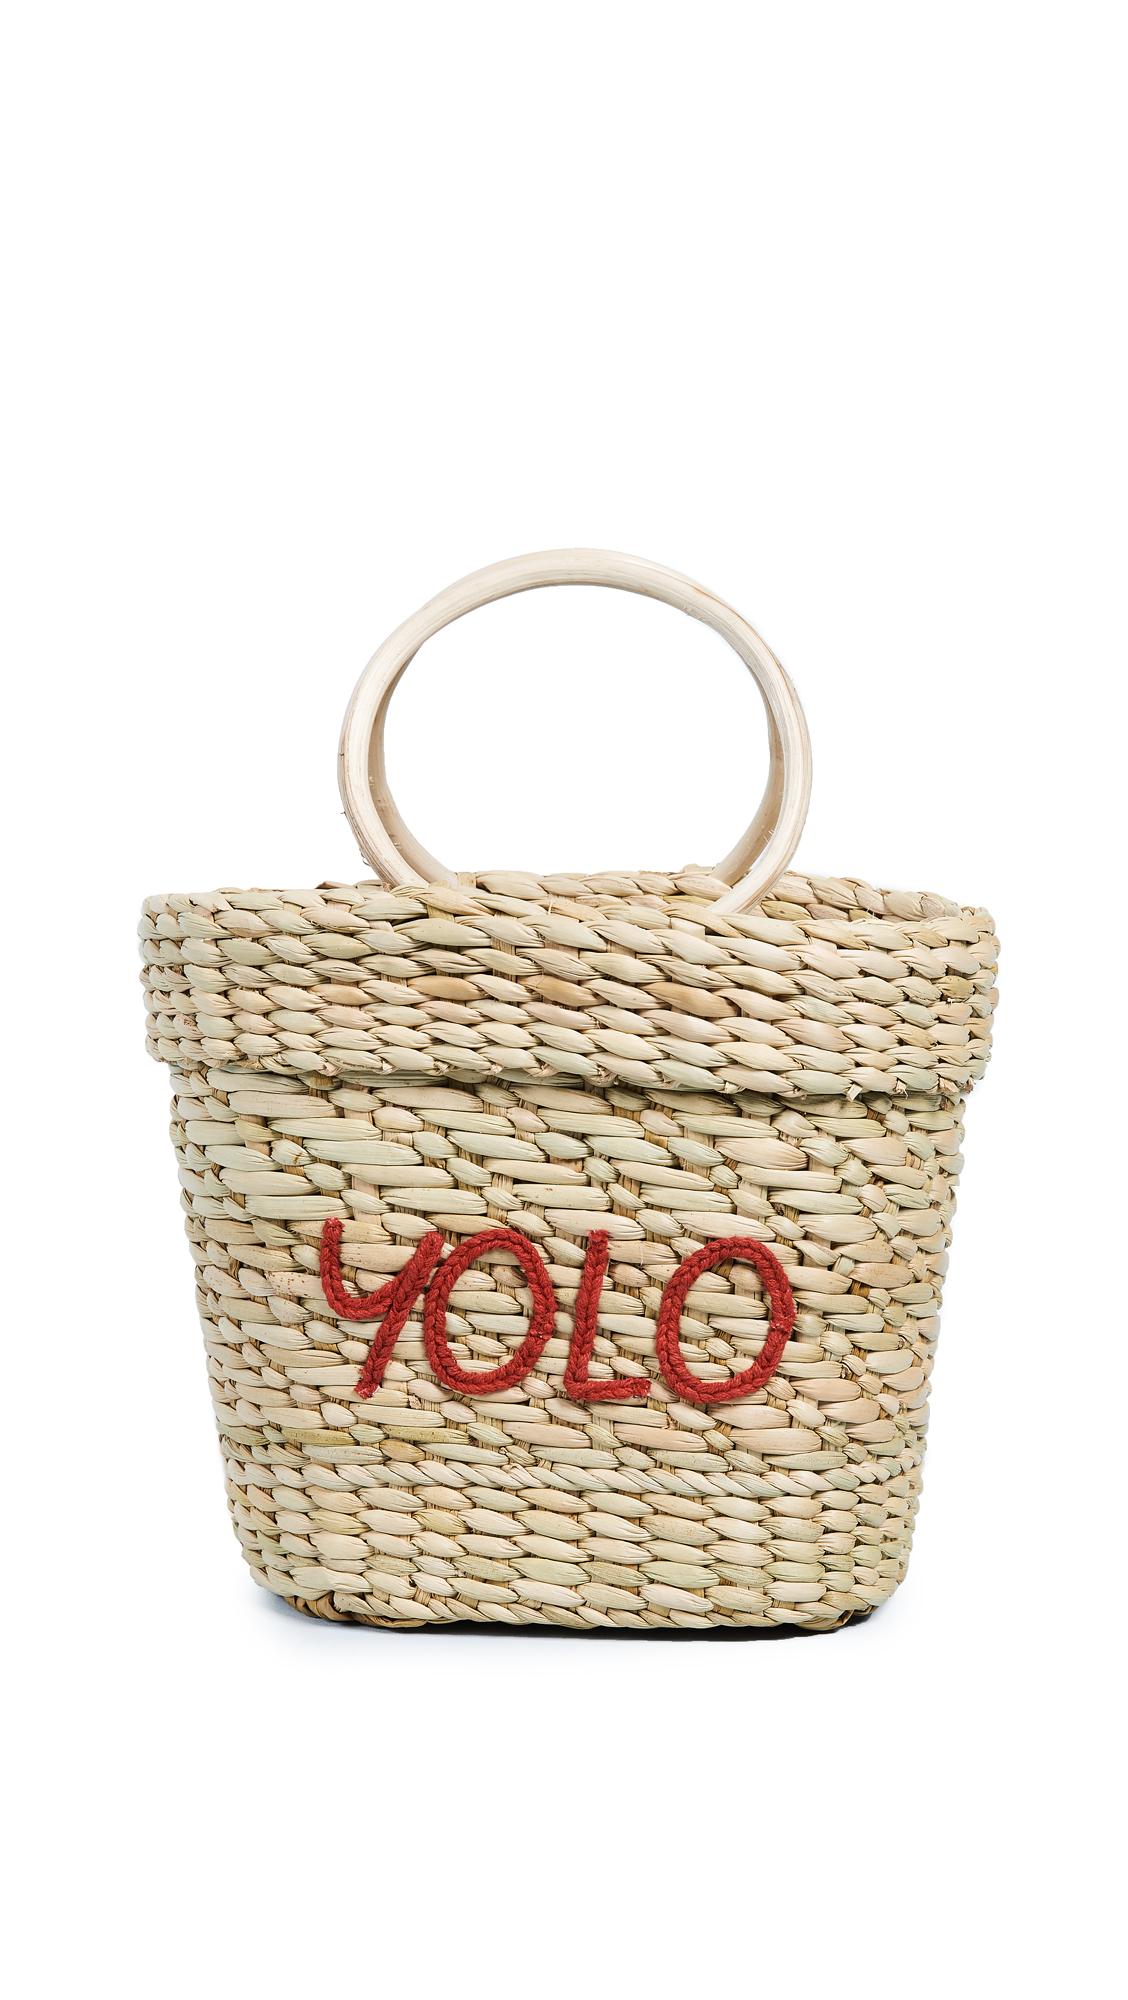 THE MAC YOLO TOTE BAG